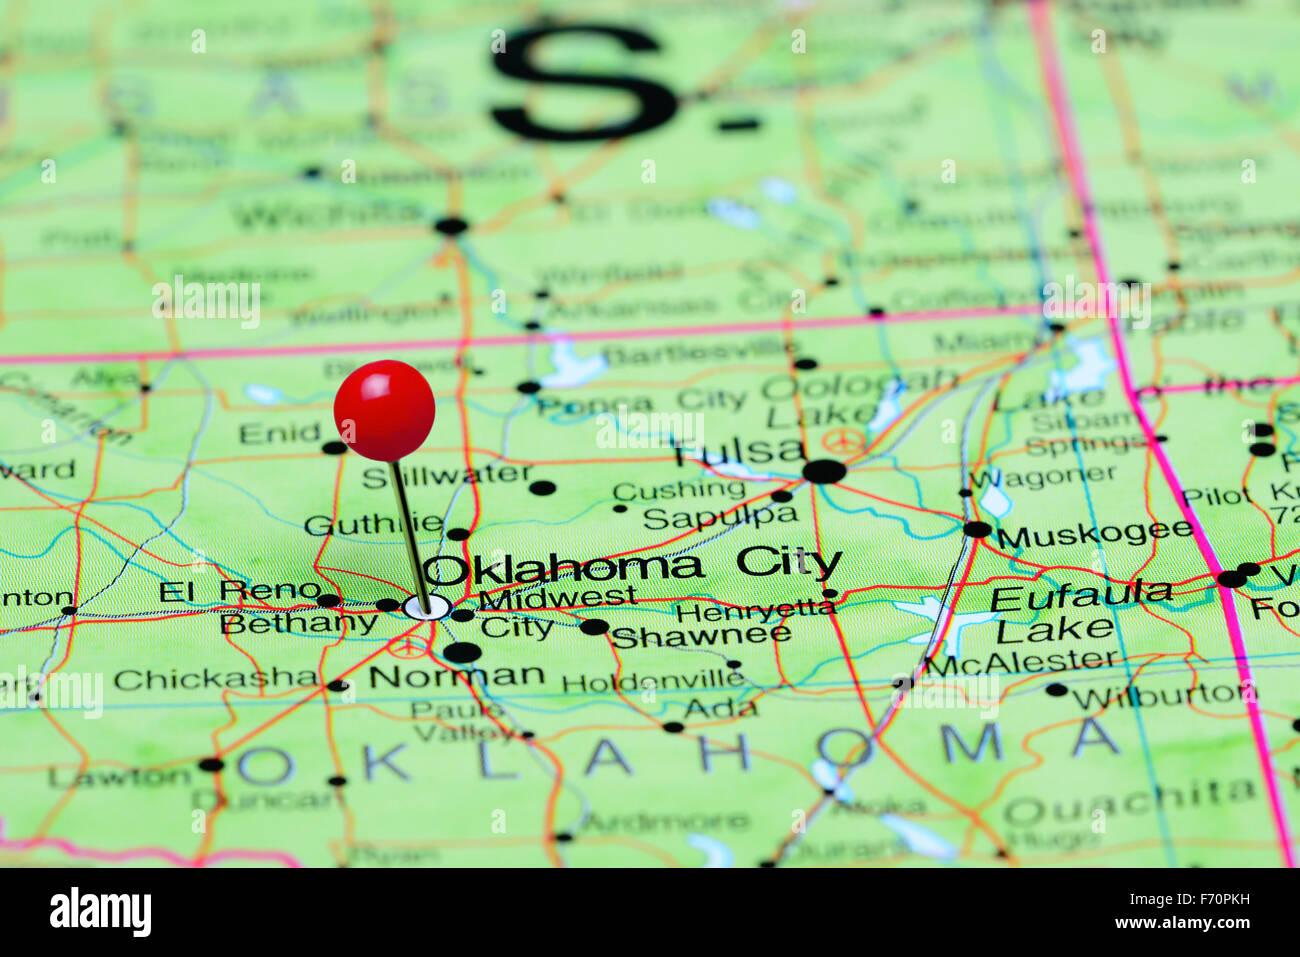 Oklahoma City pinned on a map of USA Stock Photo: 90372229 - Alamy on usa map tampa, usa map cartoon, usa map charleston, usa map virgin islands, usa map cincinnati, usa map grand rapids, usa map guam, usa map long island, usa map wichita, usa map harrisburg, usa map seminole, usa map buffalo, usa map texas, usa map by zipcode, usa map mobile, usa map fort lauderdale, usa map nd, usa map alaska, usa map georgia, usa map santa fe,